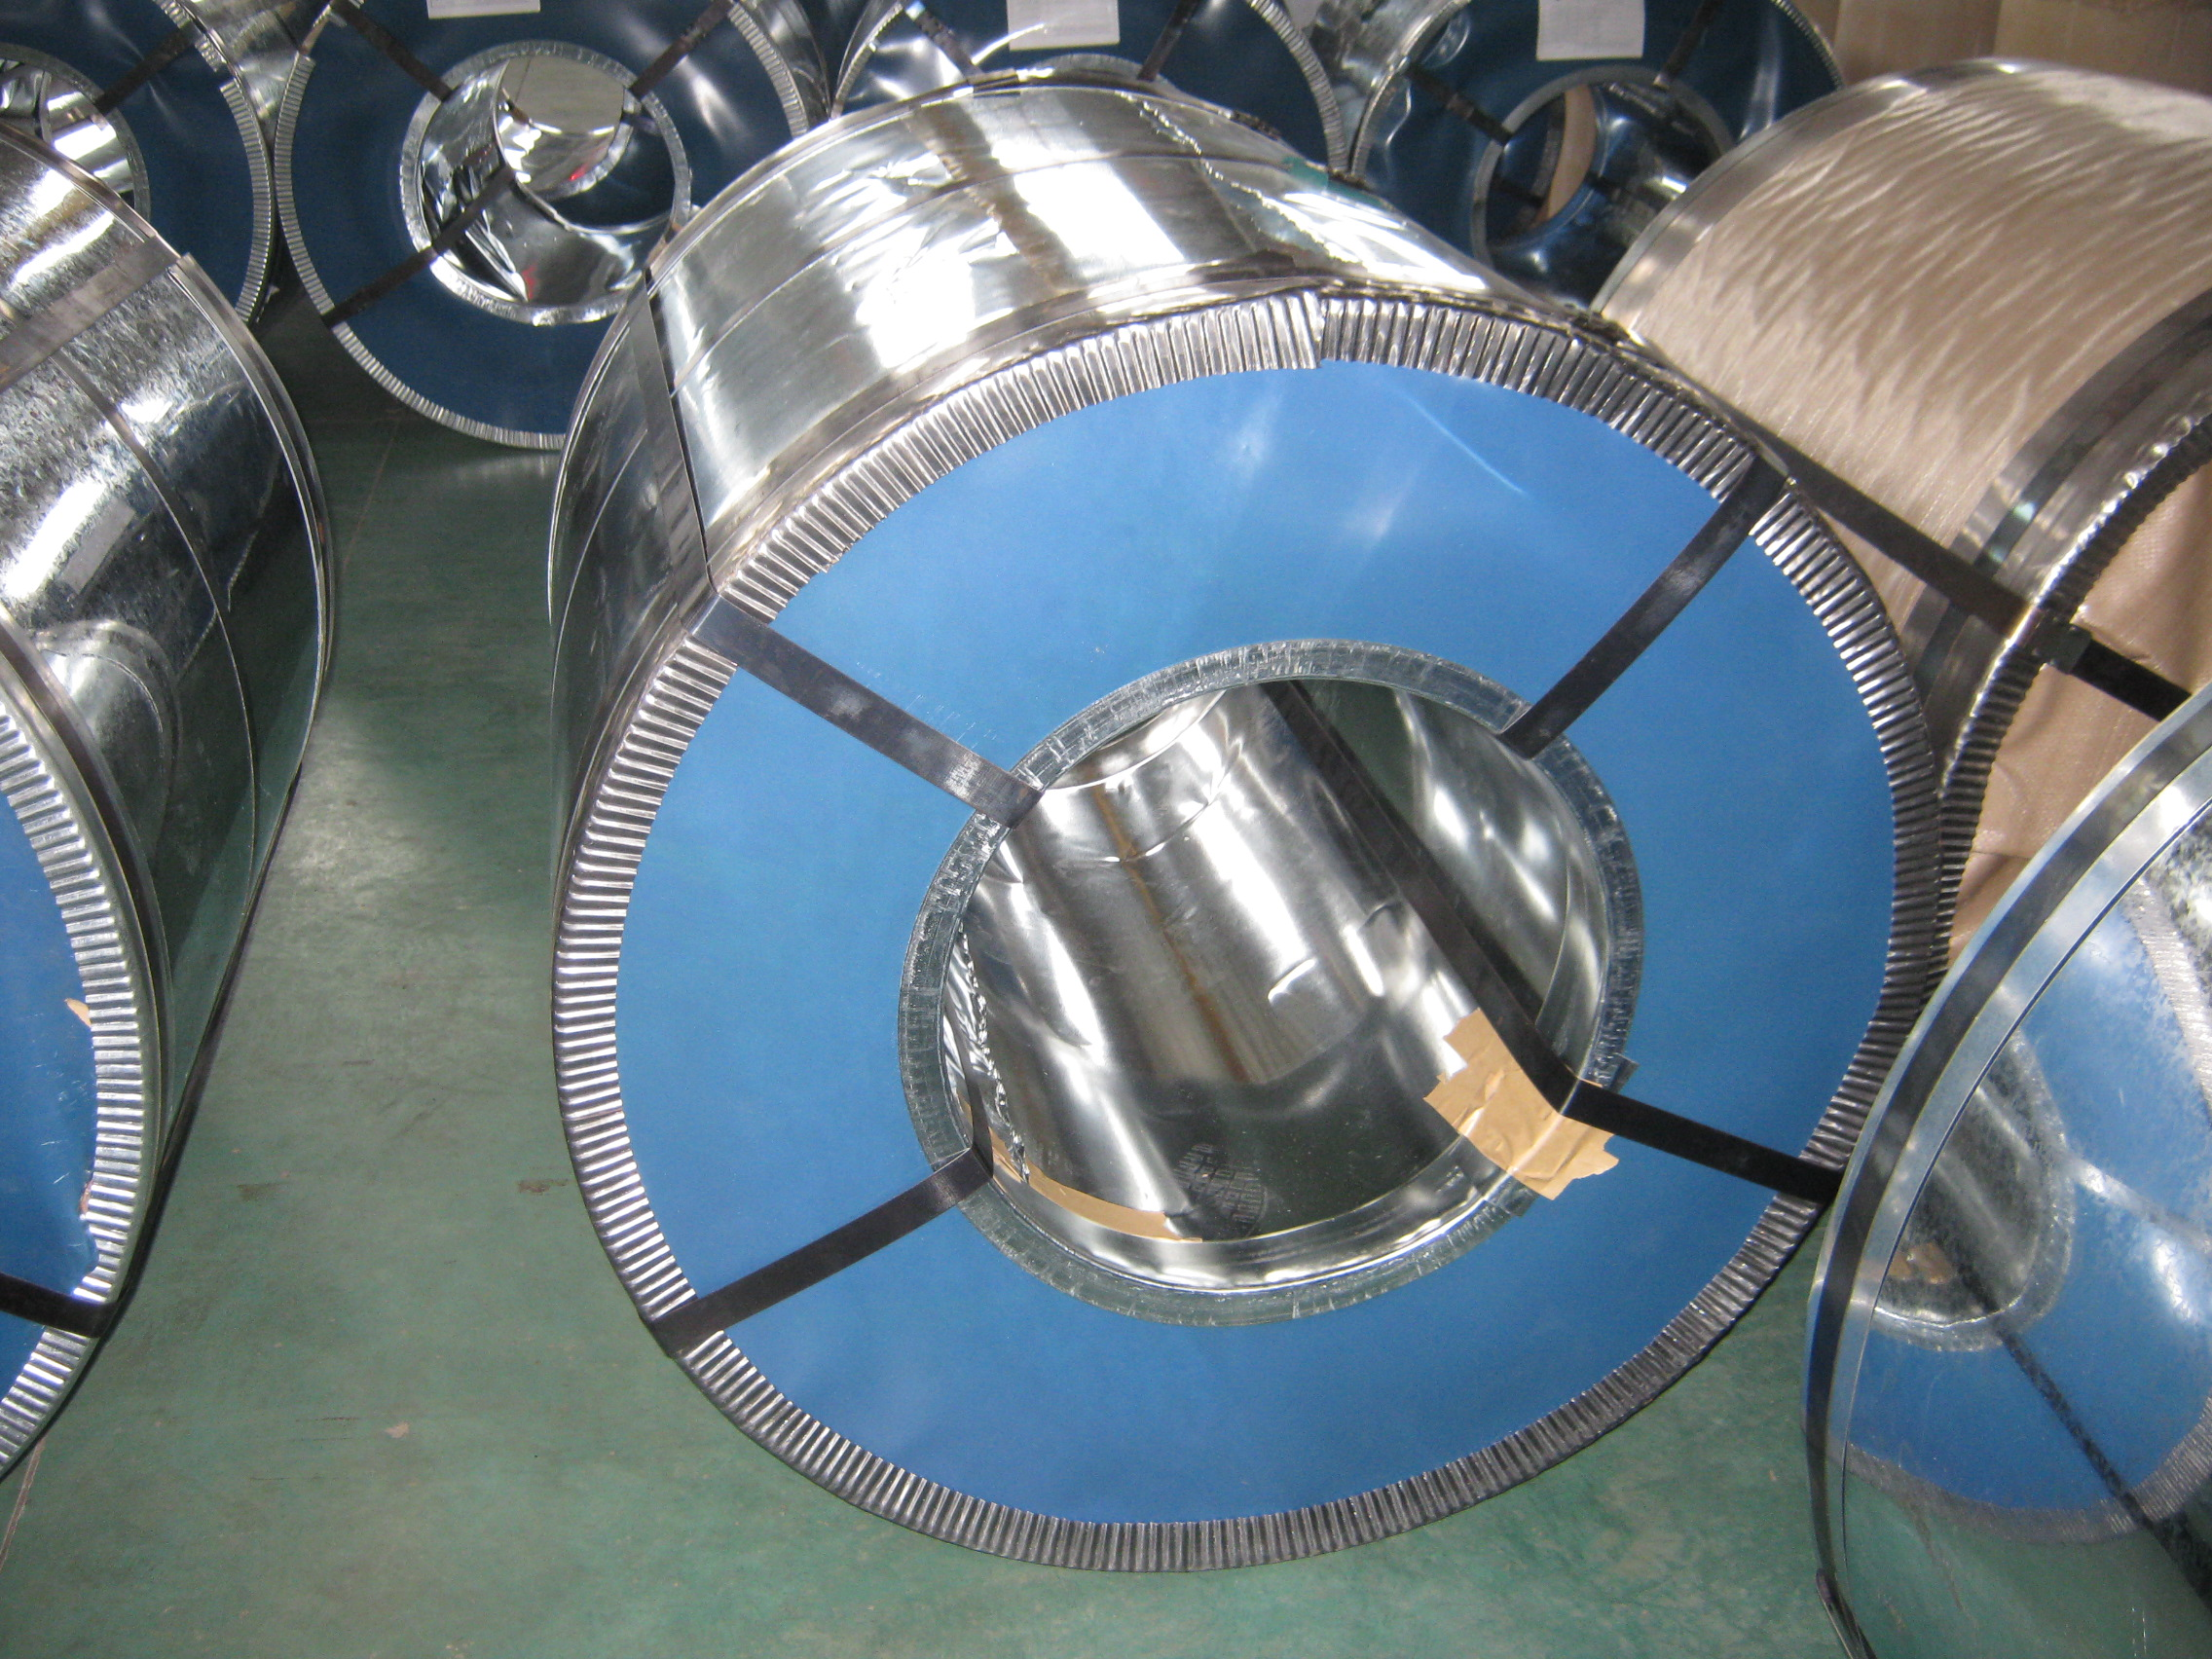 Hot dip galvanzied steel sheet in coils